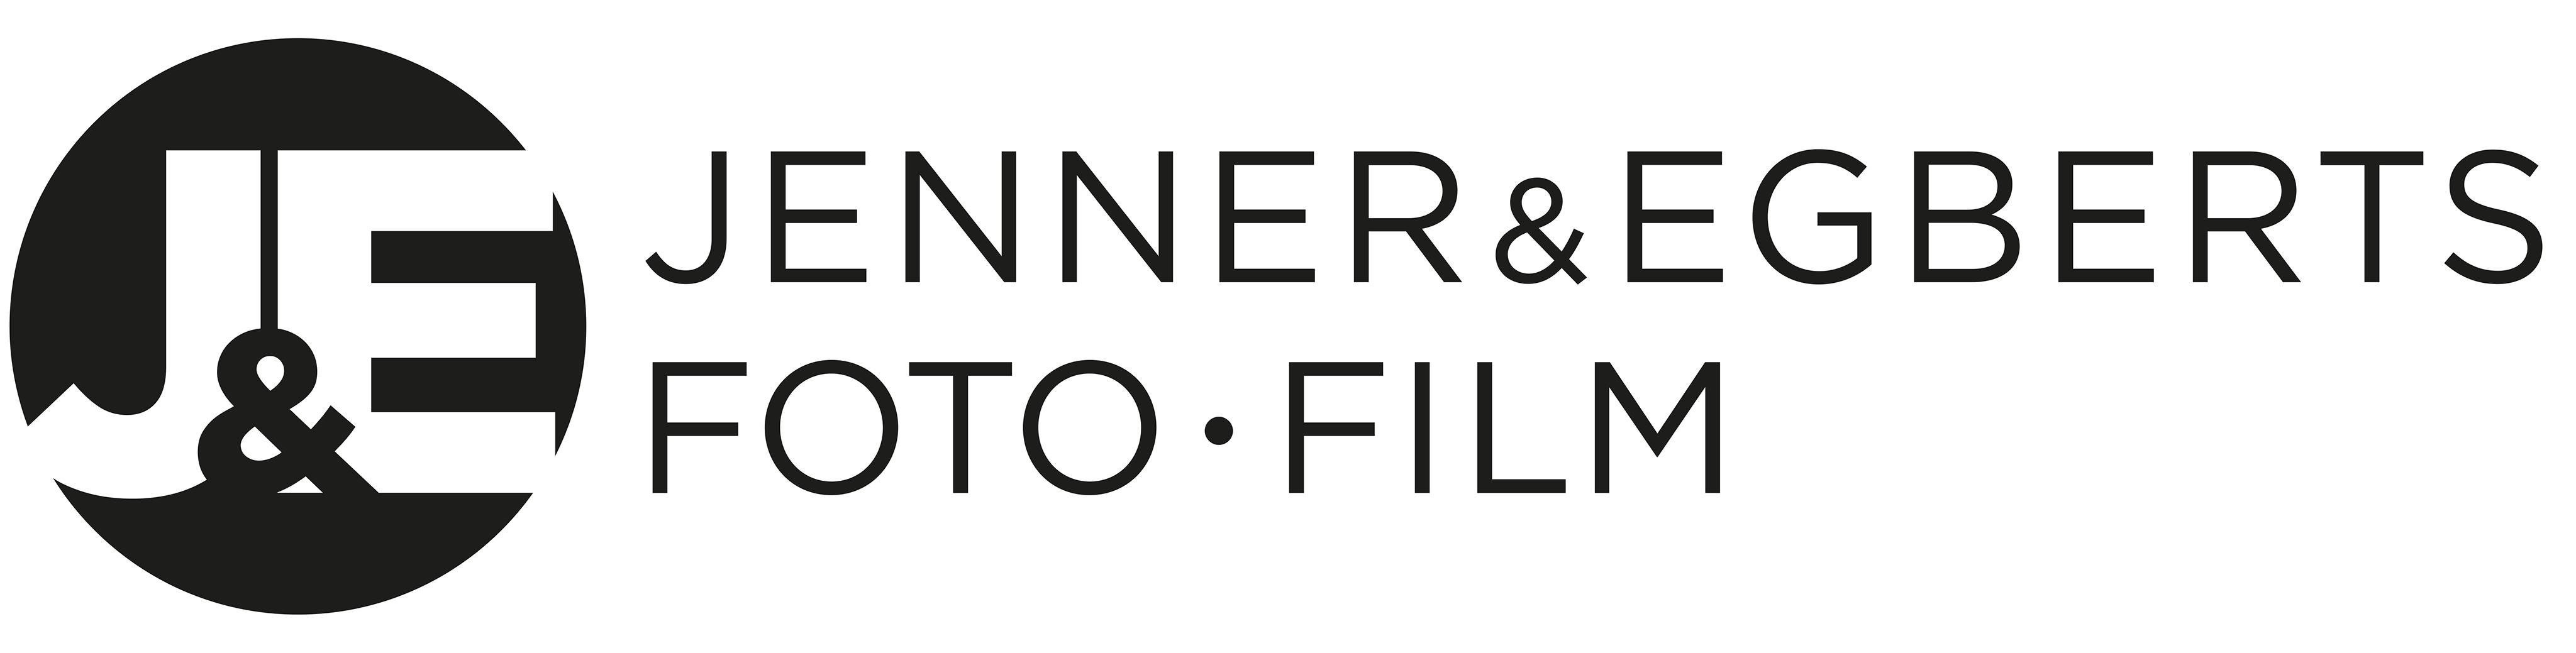 JENNER & EGBERTS Foto / Film